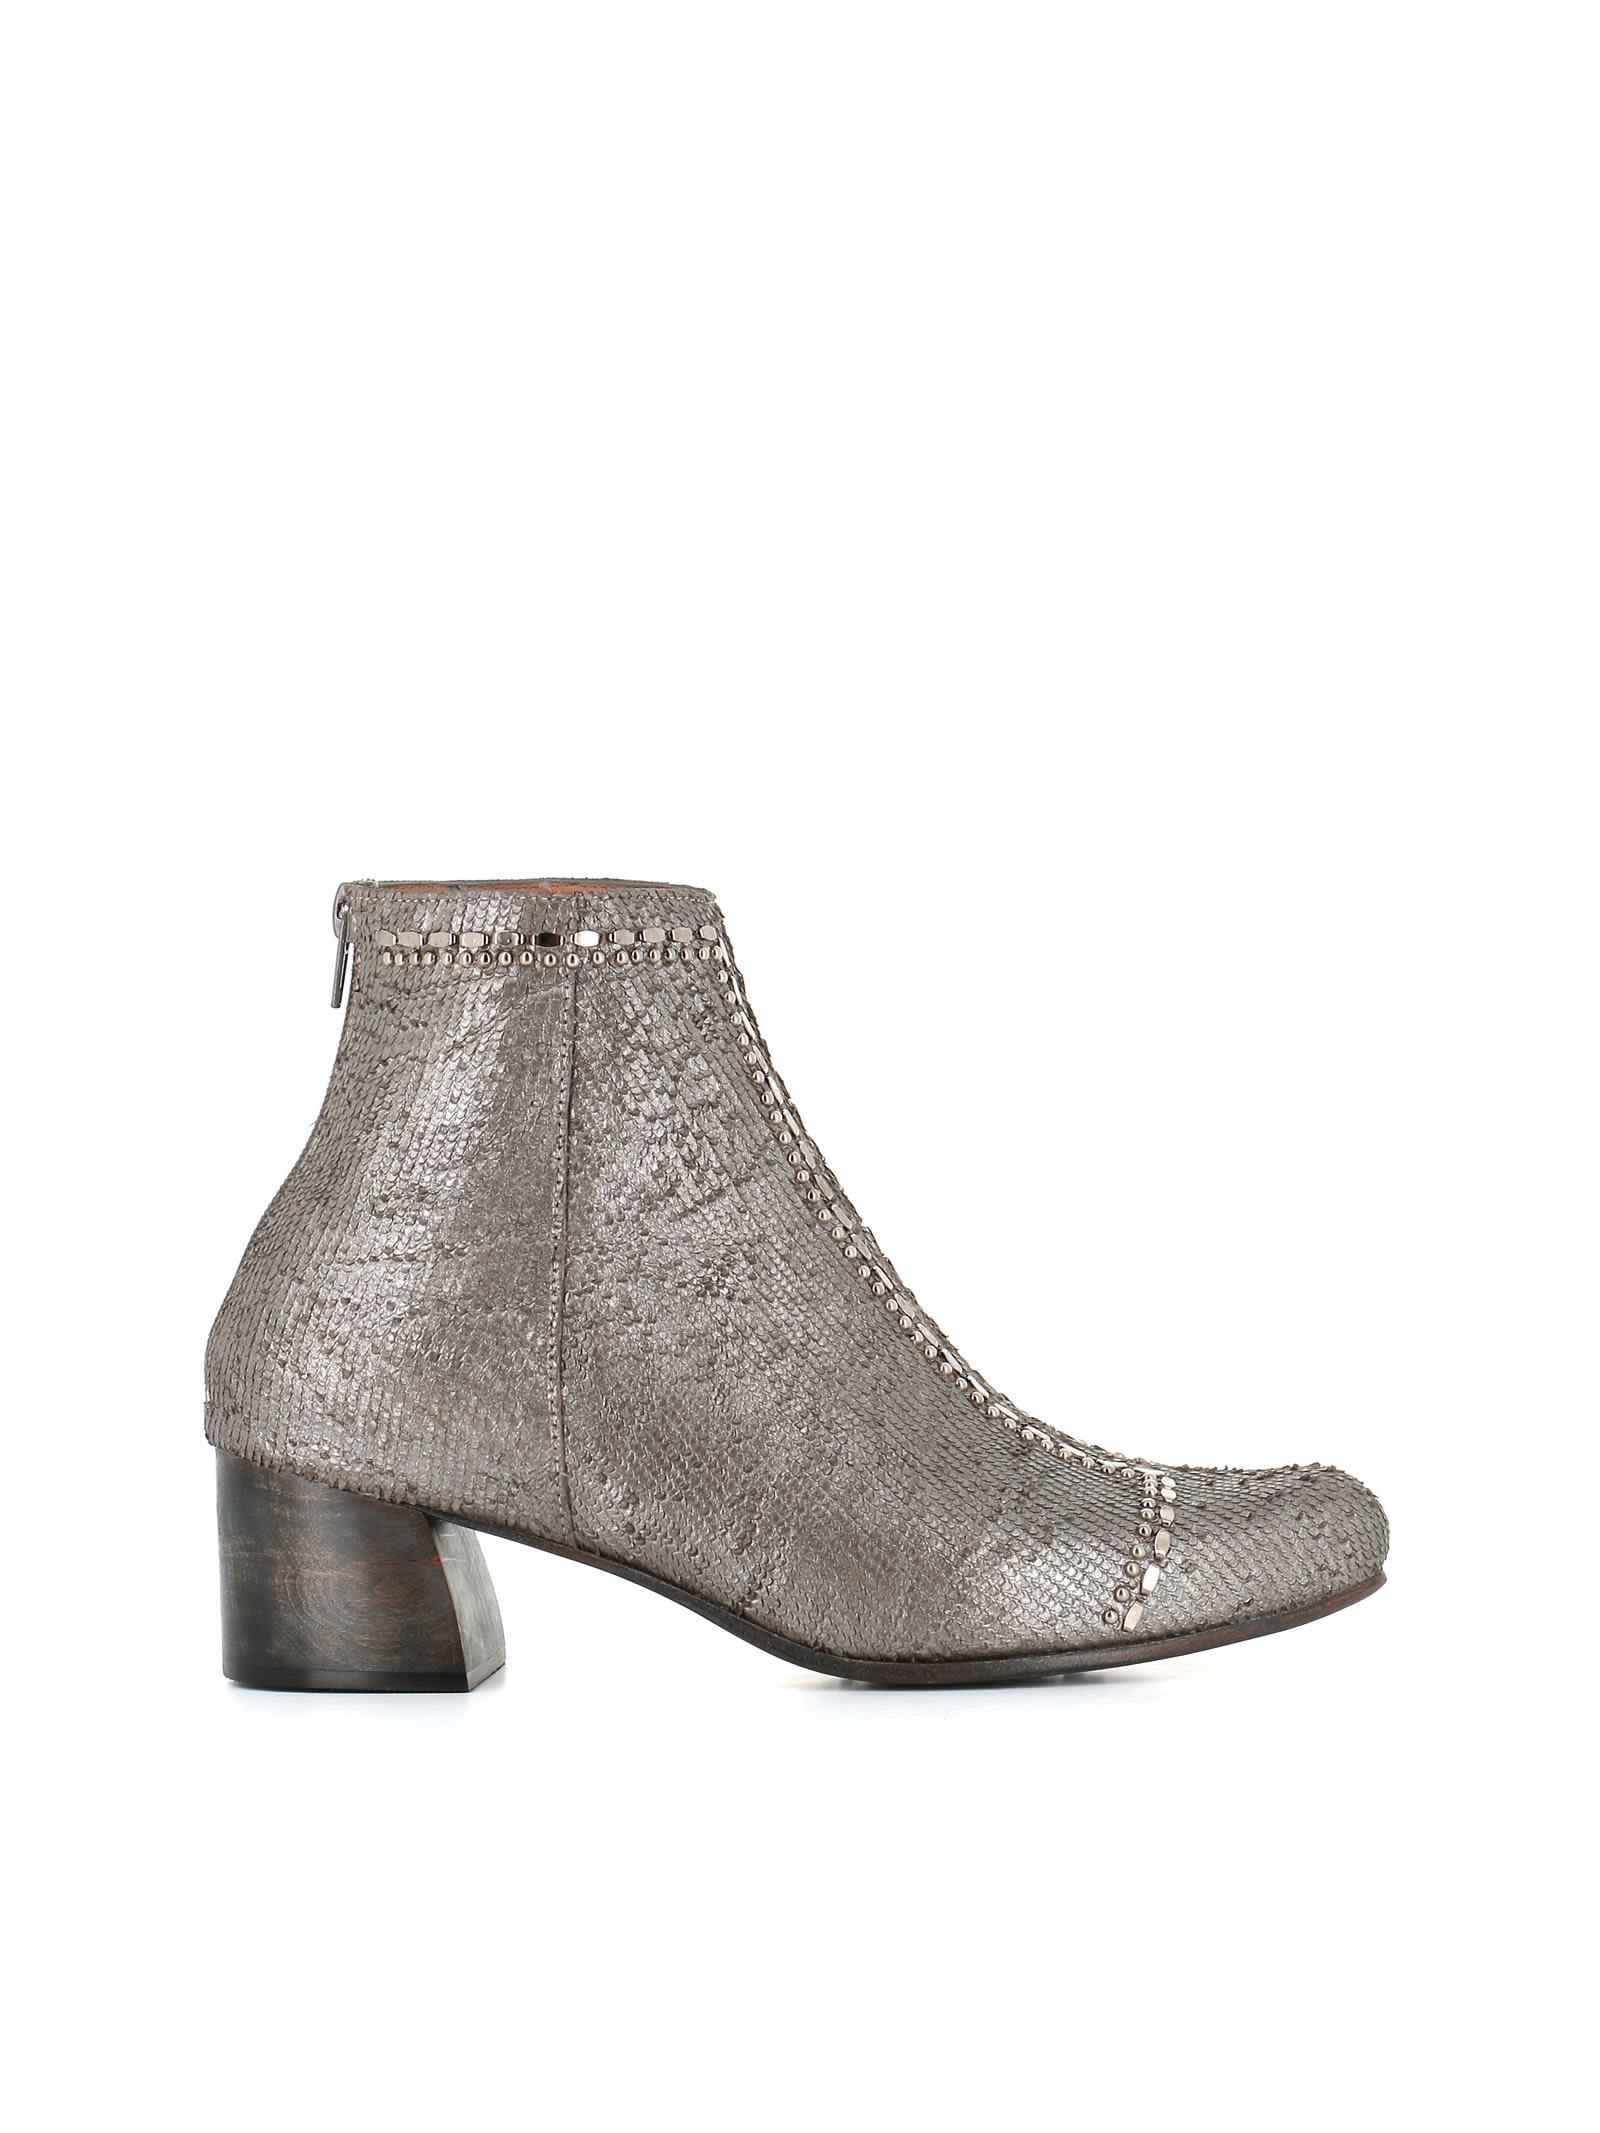 "CALLEEN CORDERO Boots ""Blaze"" in Silver"